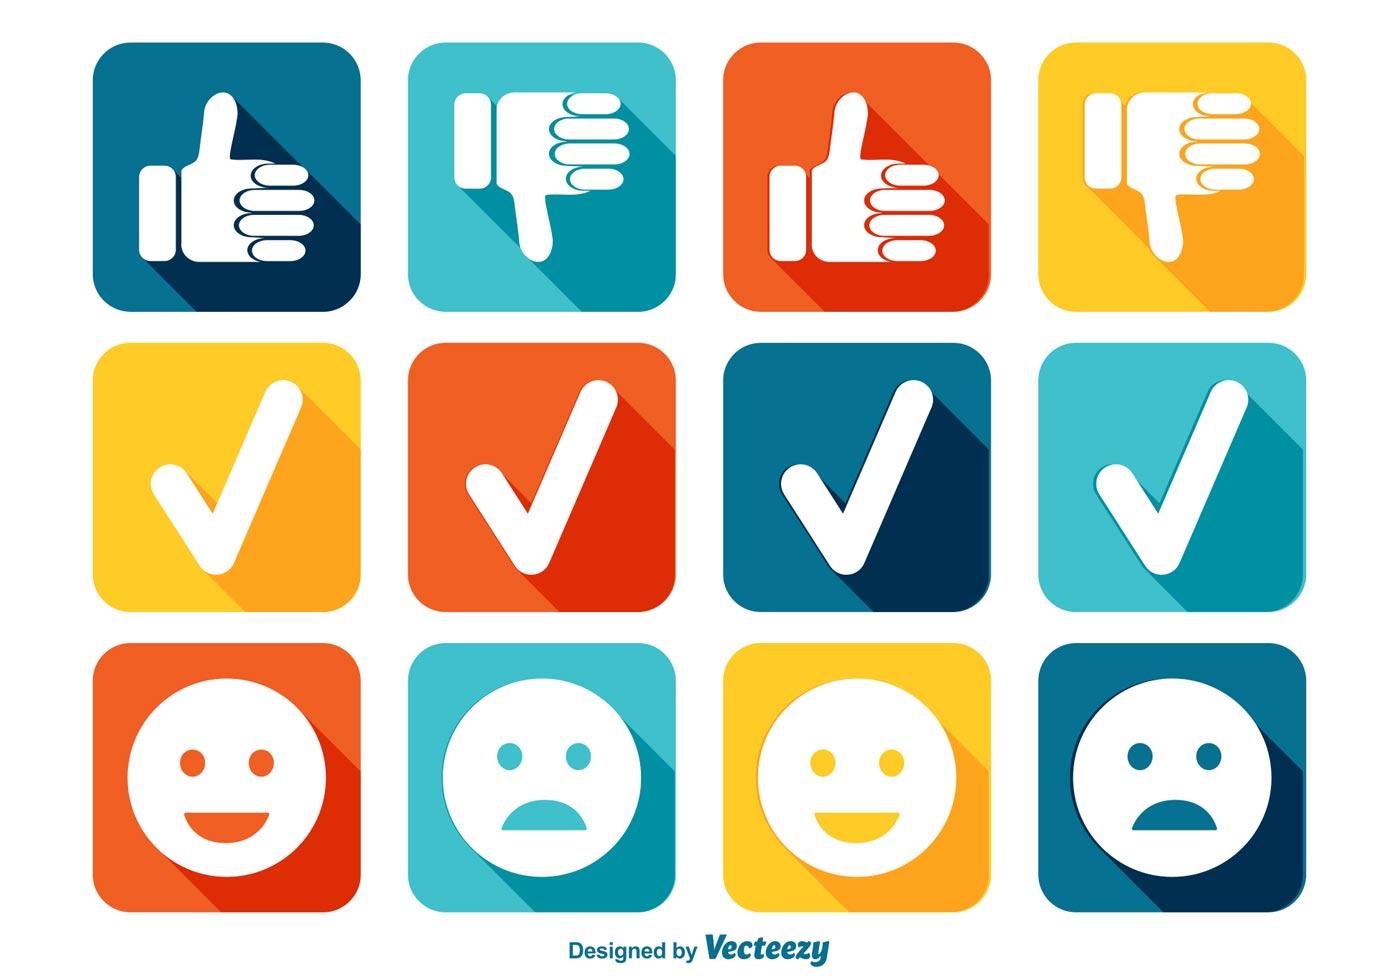 like and dislike icon set download free vector art